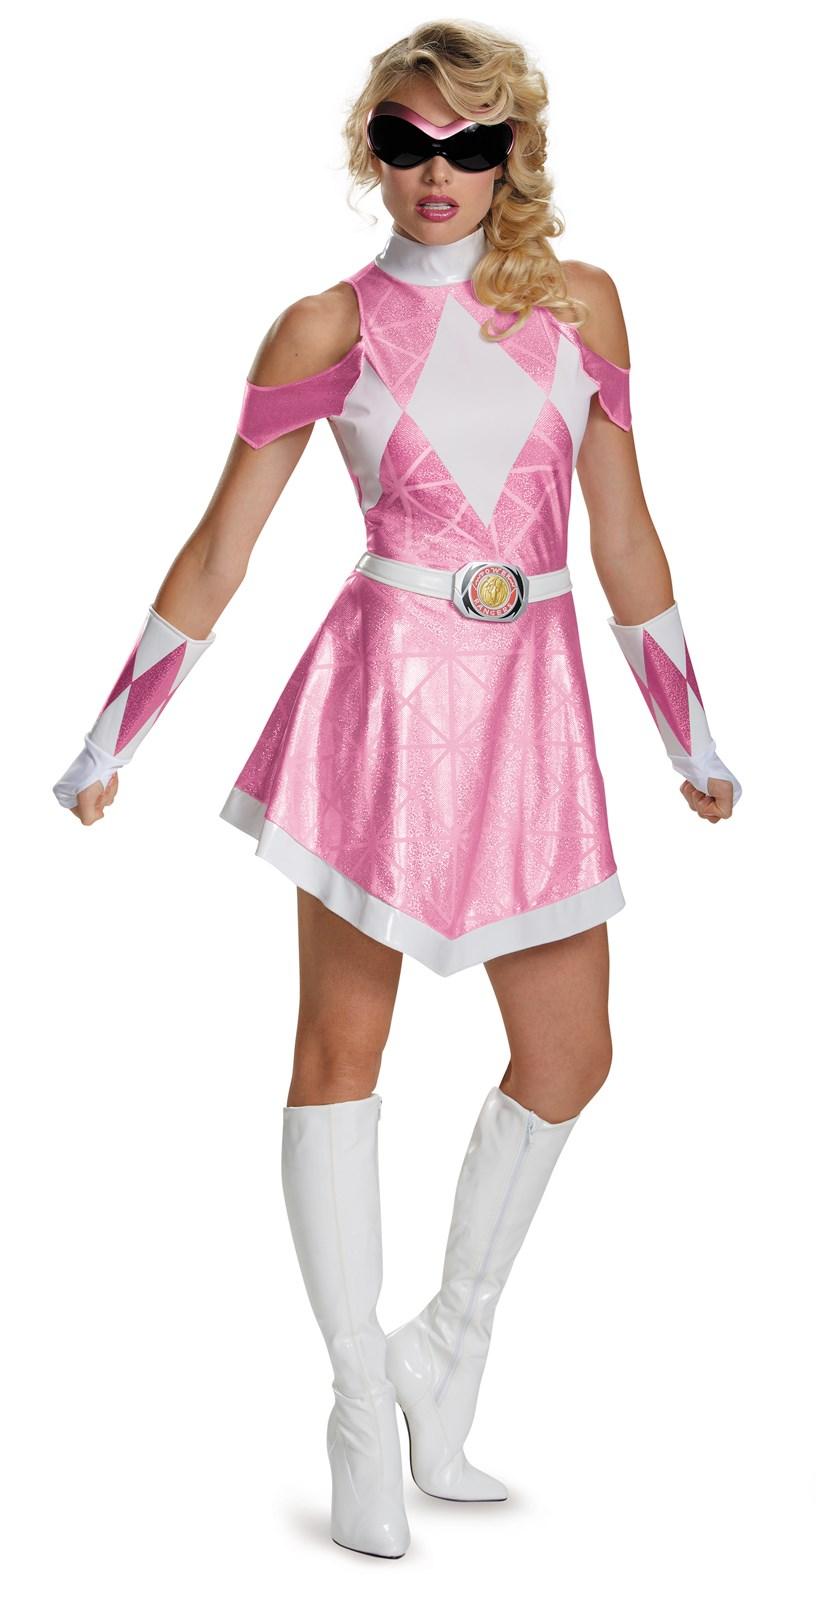 Mighty Morphin Power Rangers: Deluxe Sassy Pink Ranger Costume For ...